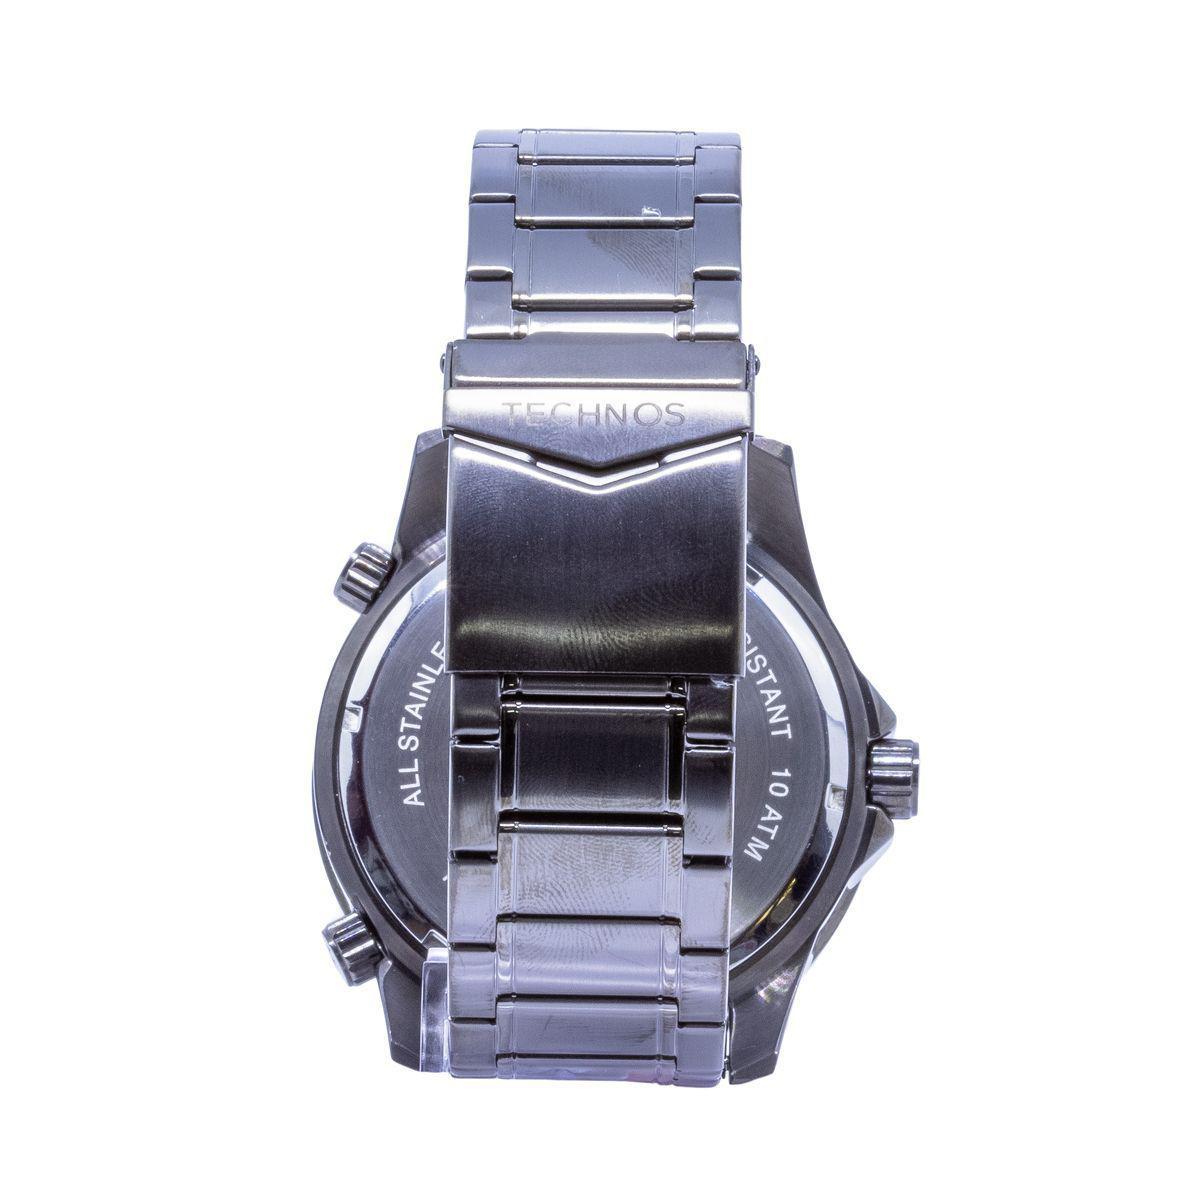 55383d25898 Relógio Technos Cronógrafo Masculino - 2035MLB 4A - Relógio ...